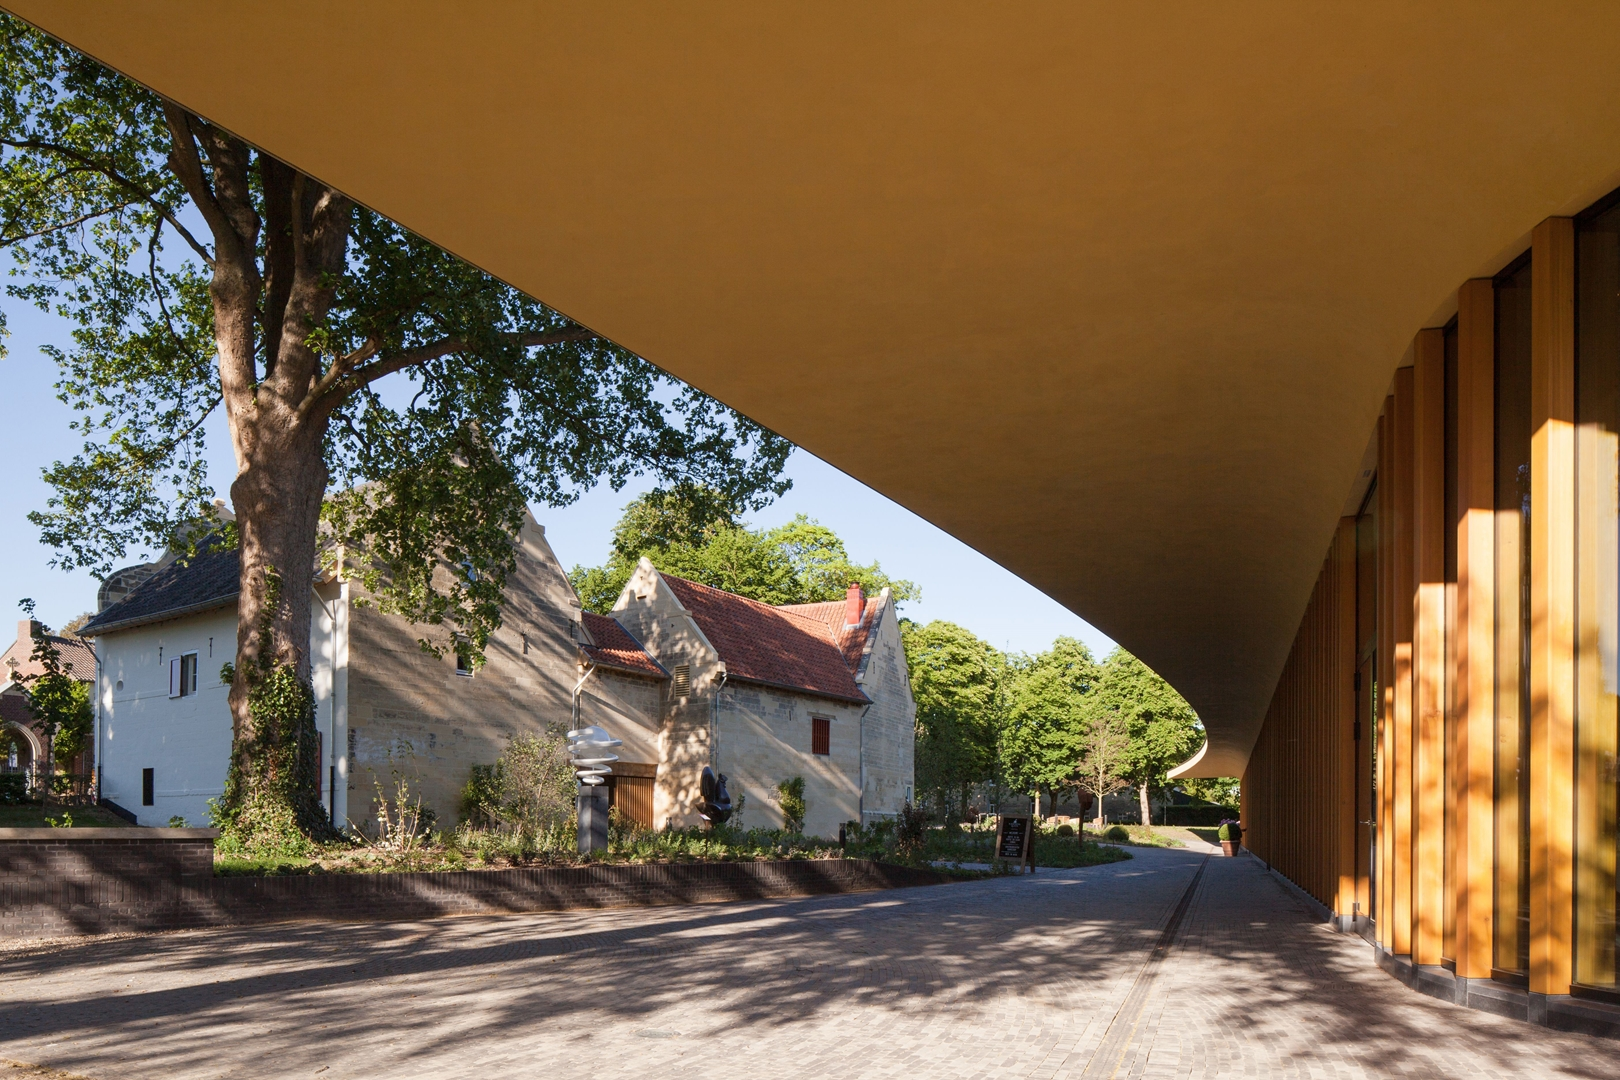 05_St Gerlach pavilion and manor farm_Photo by Mecanoo architecten (Copy)